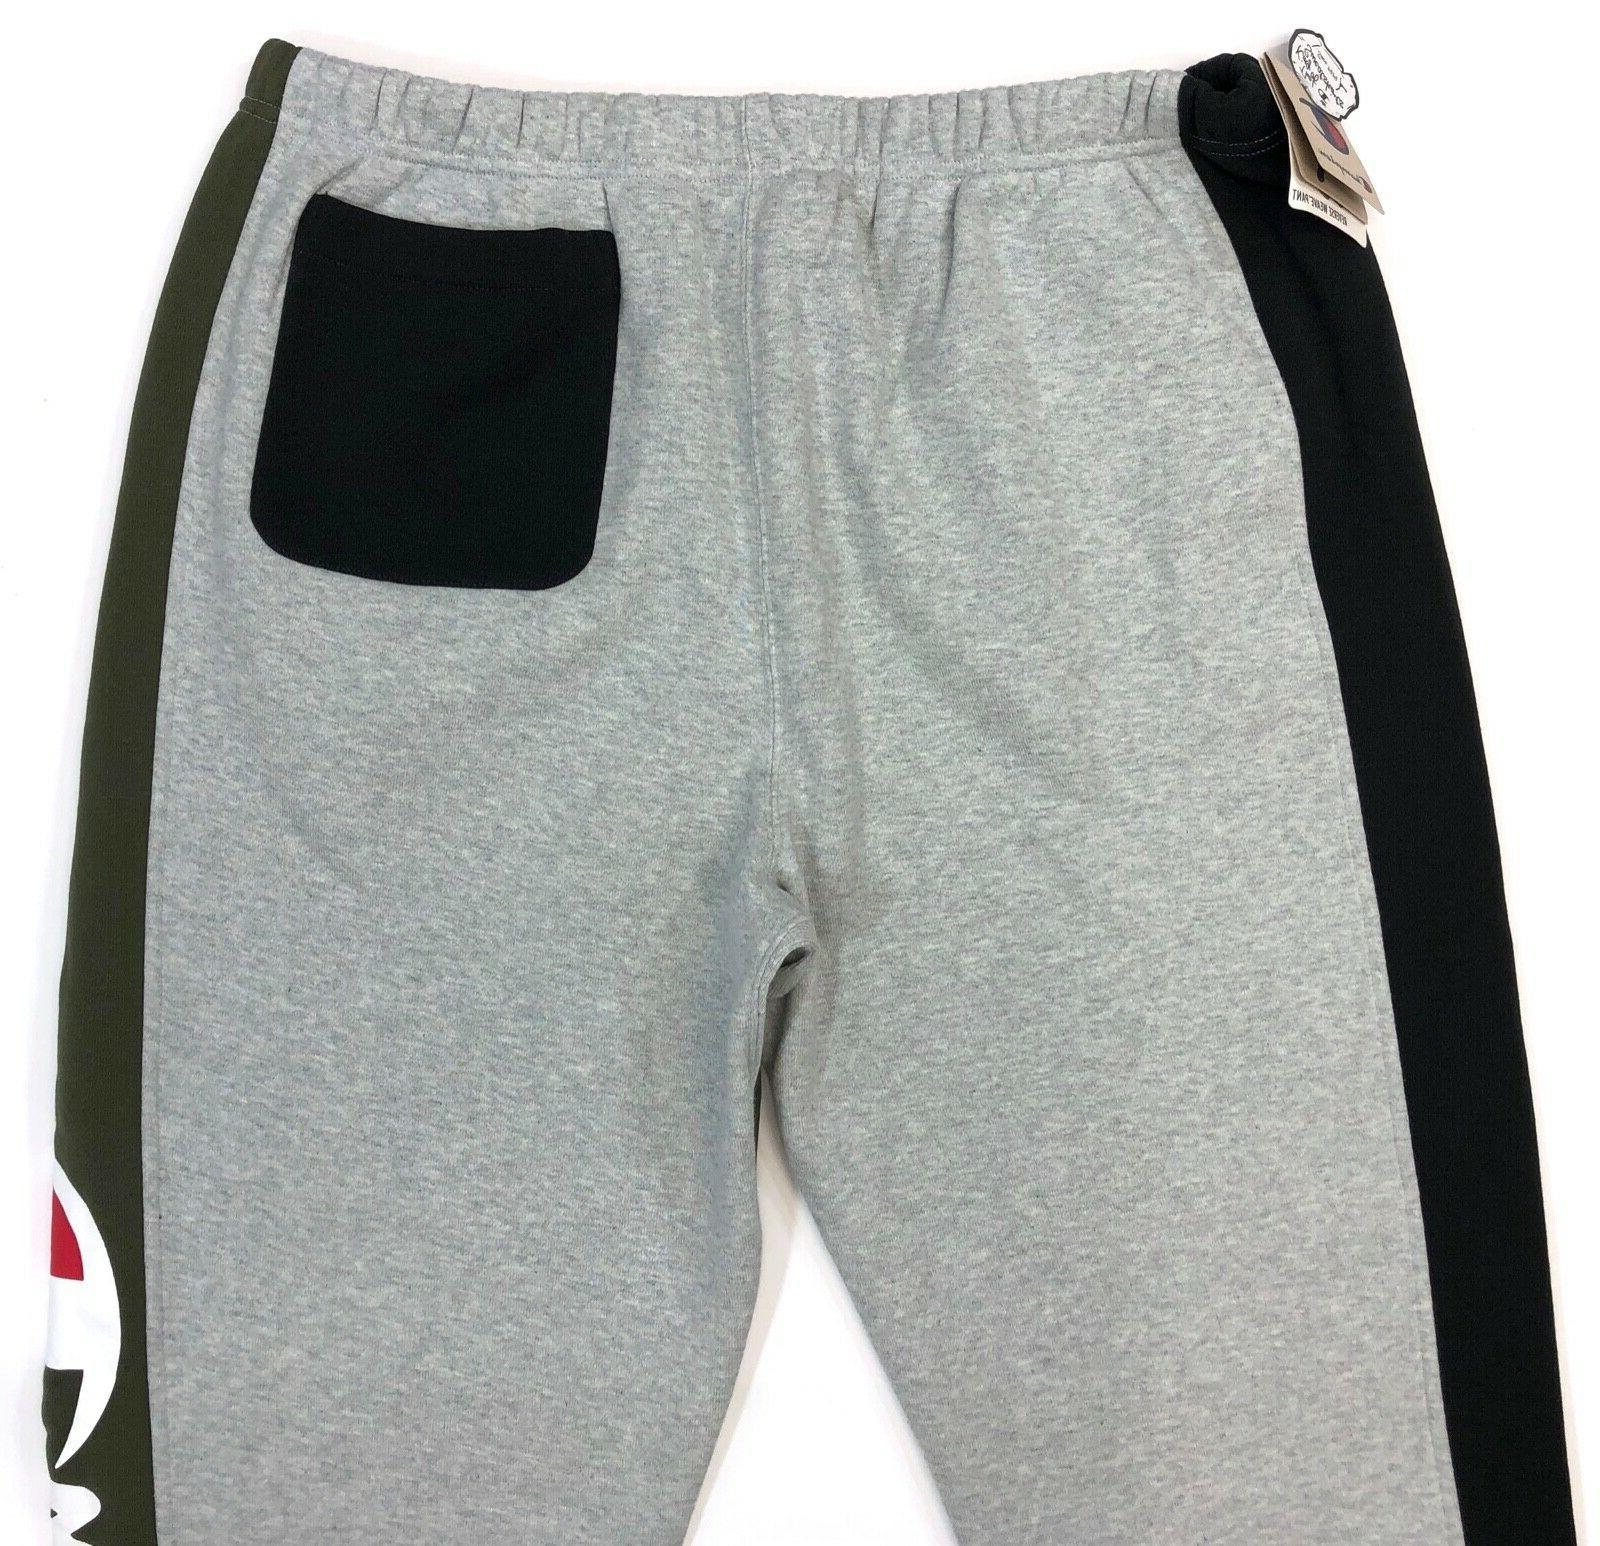 NWT Reverse Weave Sweatpants XL